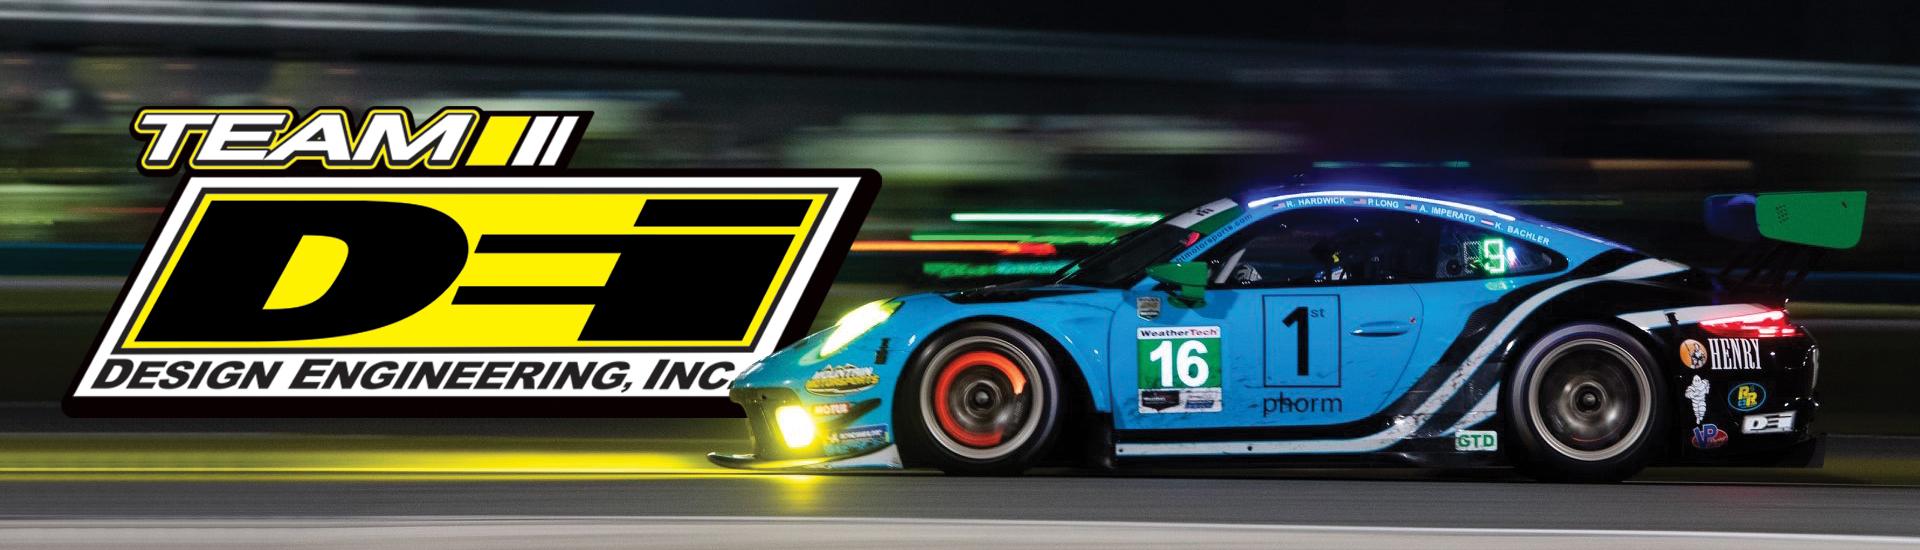 wright-mtrspt-sponsorship-web-graphic.jpg